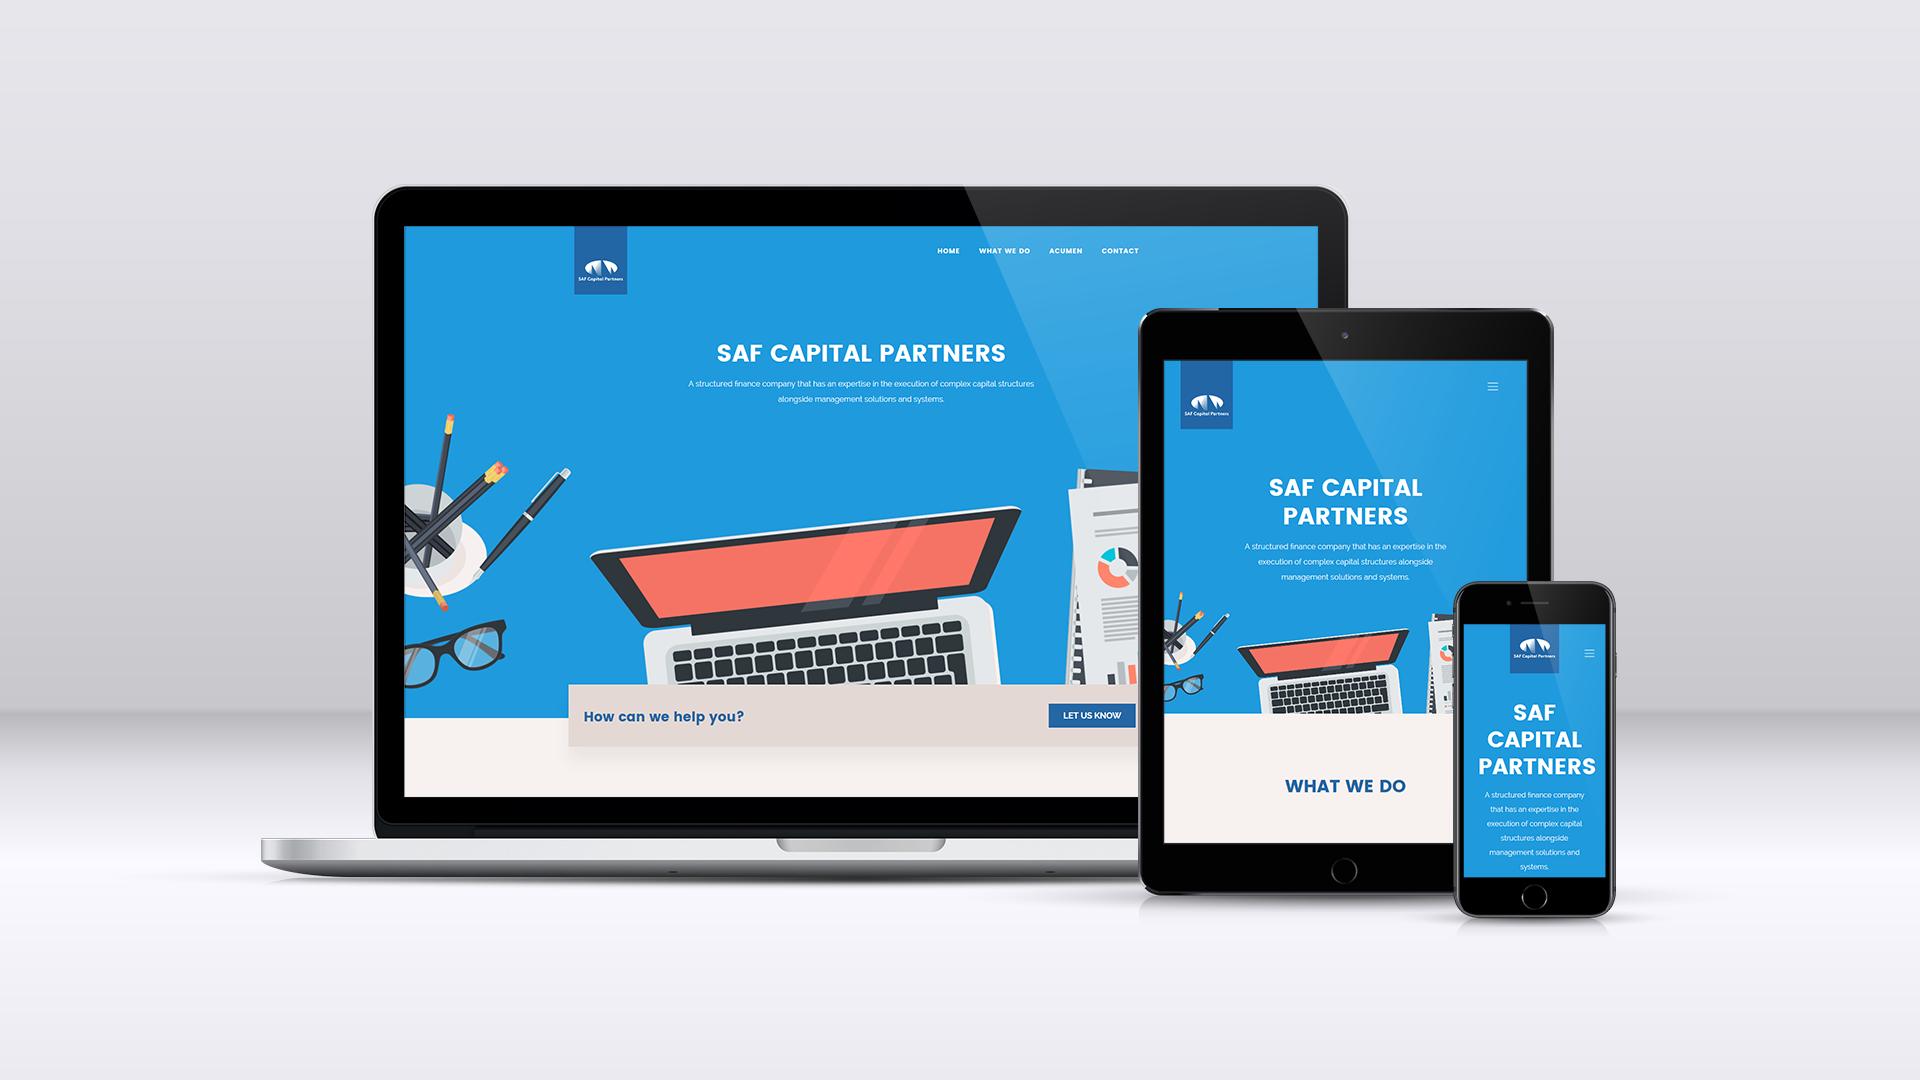 SAF Capital Partners